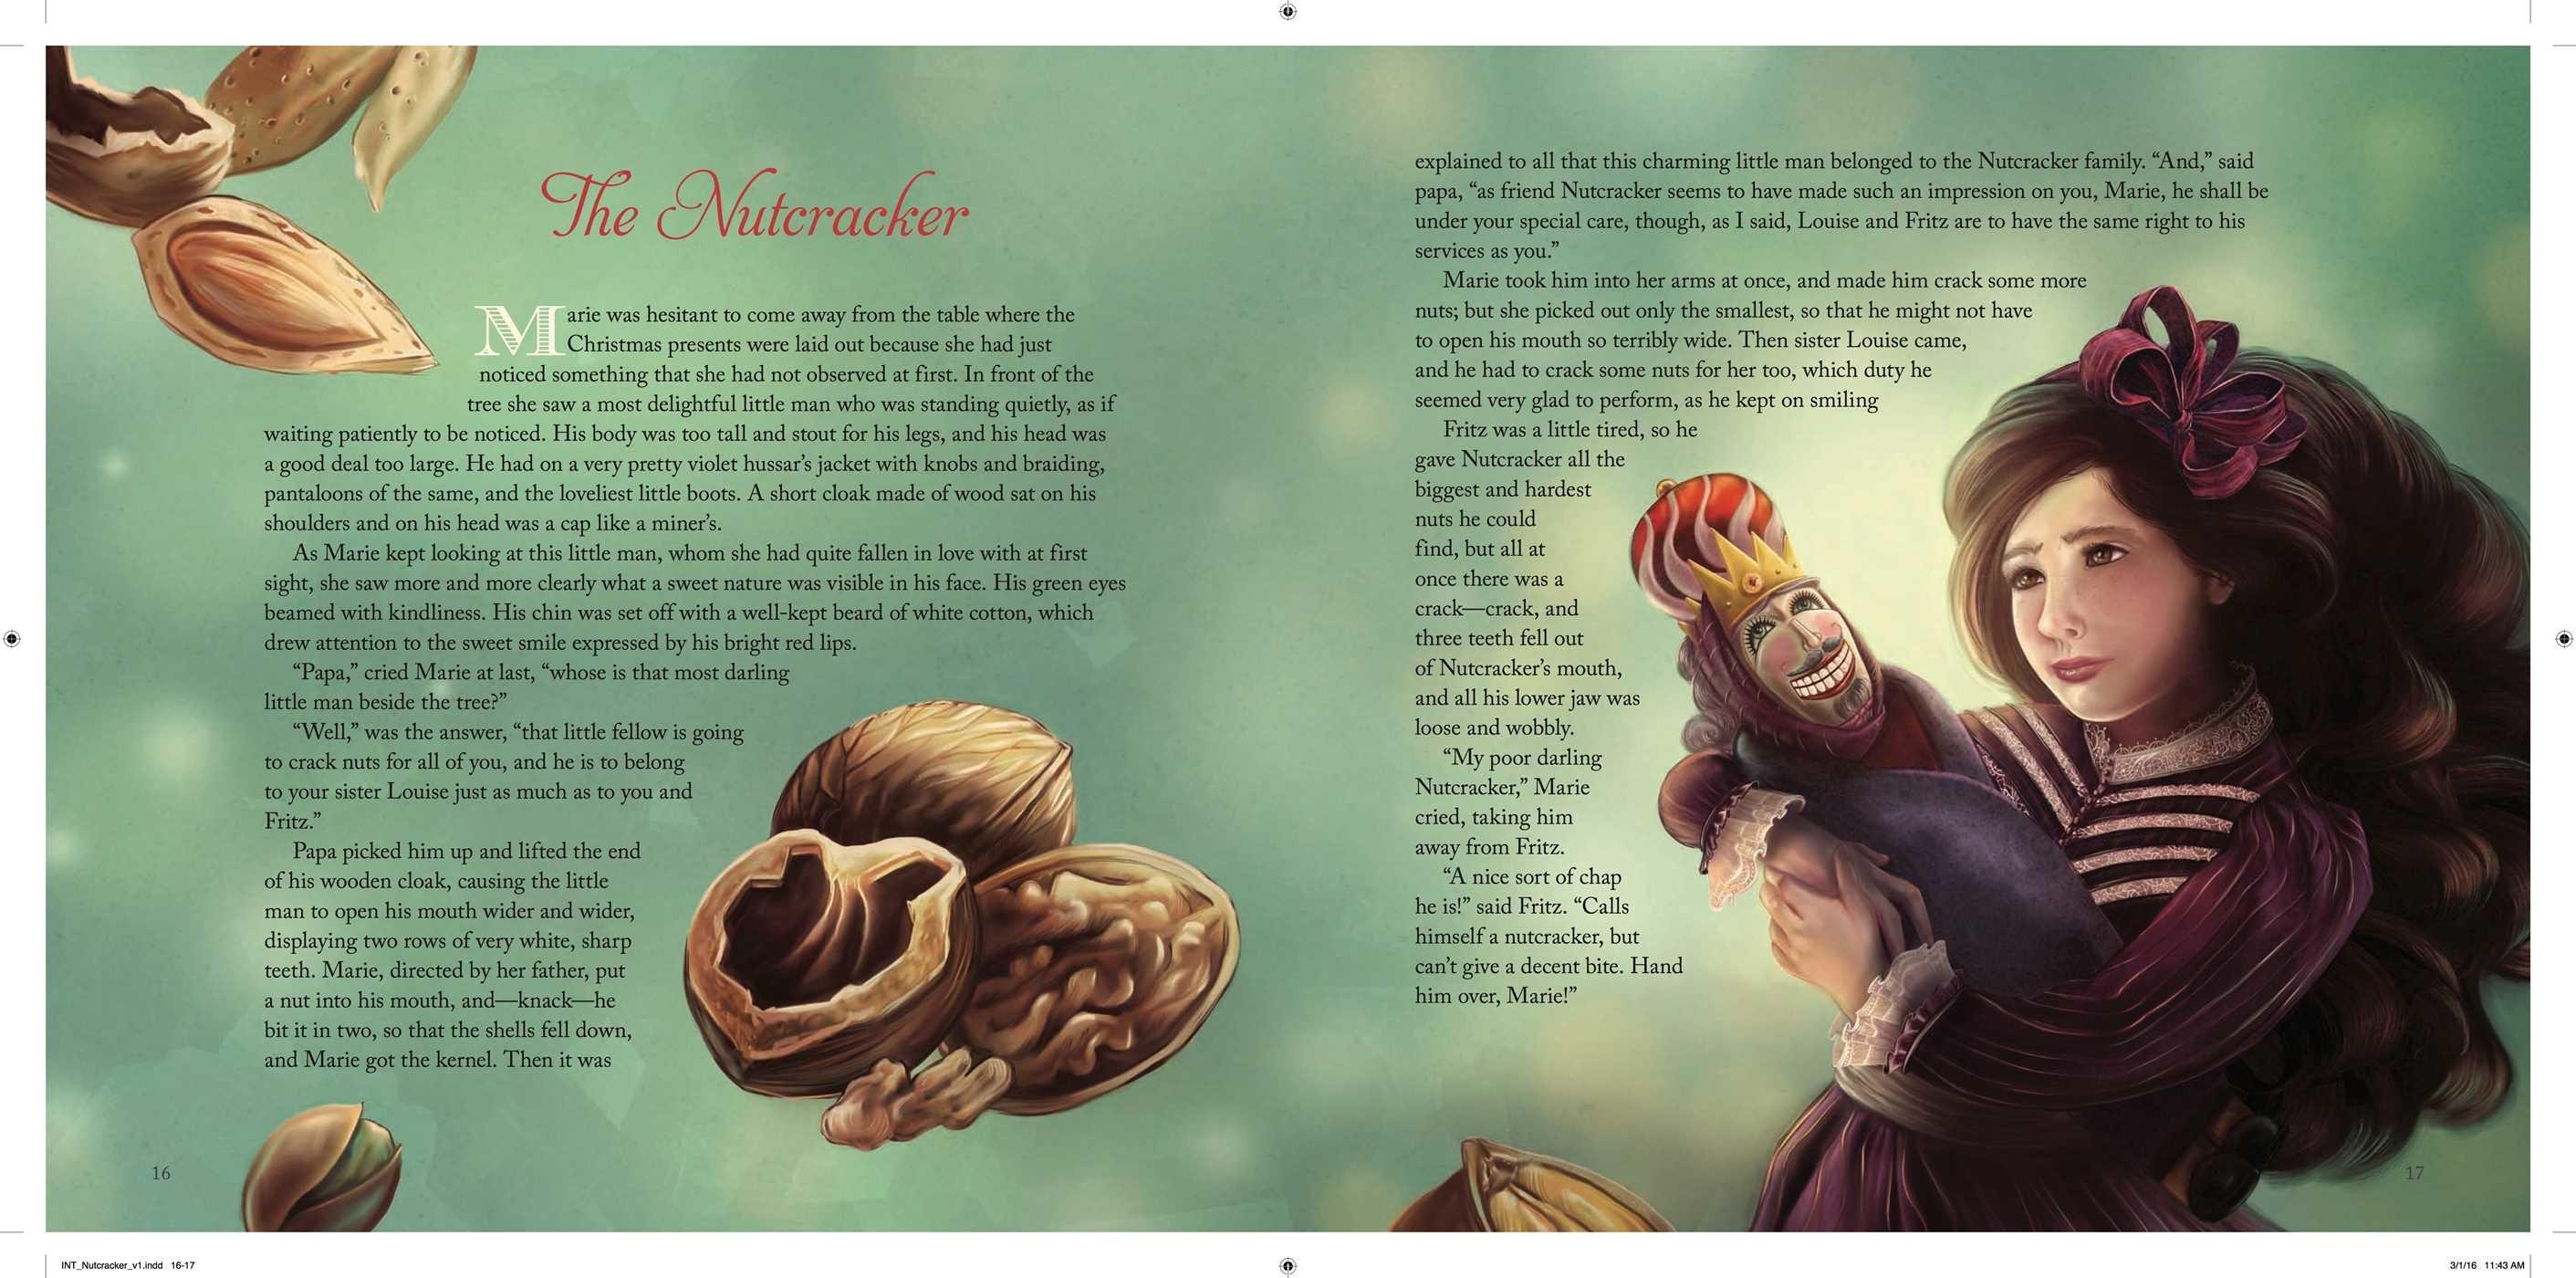 The nutcracker 9781604336306.in05